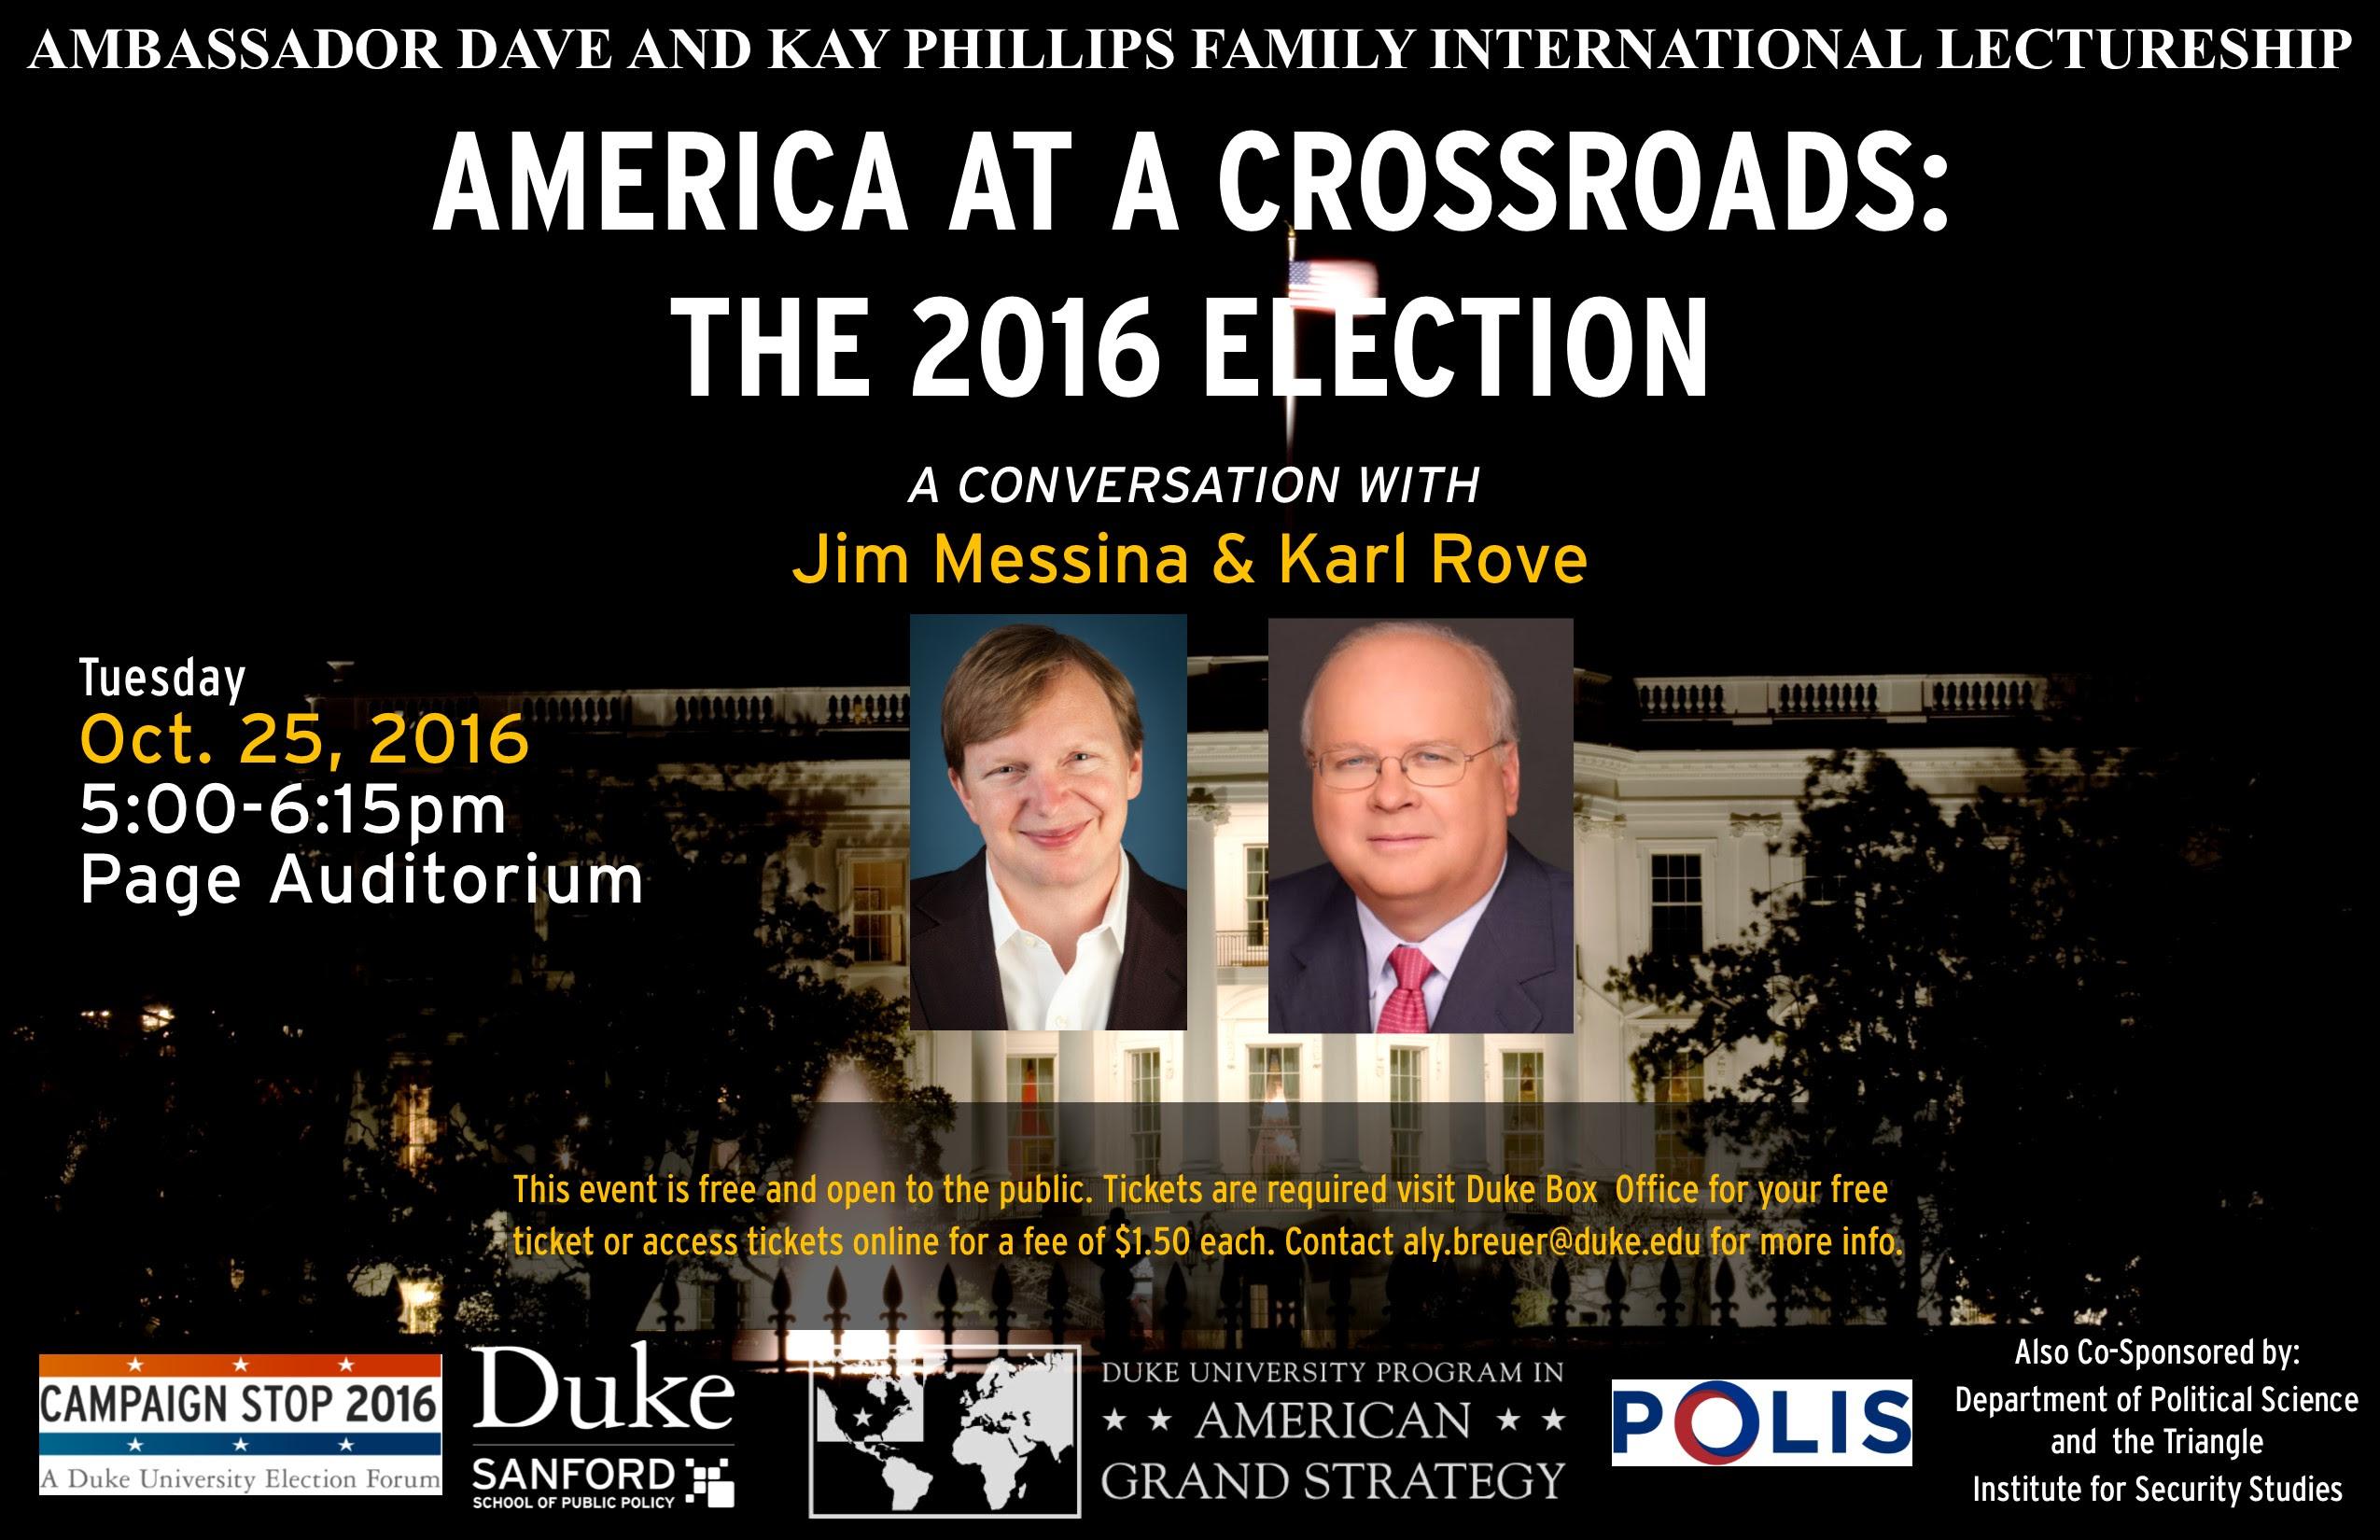 America at a Crossroads: The 2016 Election @ Page Auditorium | Durham | North Carolina | United States